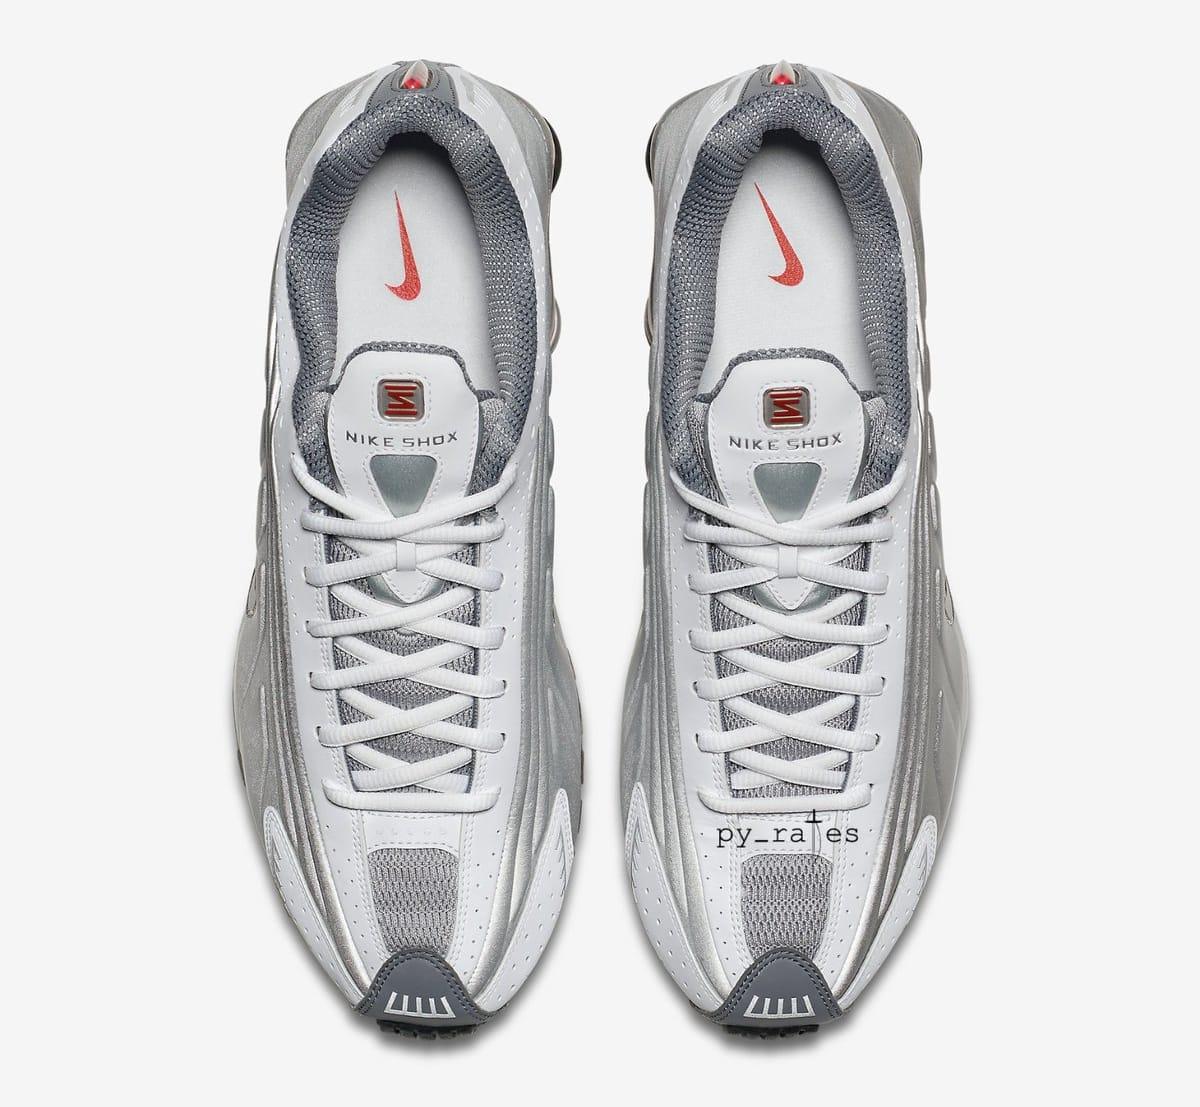 super popular 858d4 4f1a5 ... nike shox r4 red Nike Shox Shoes Champs ...